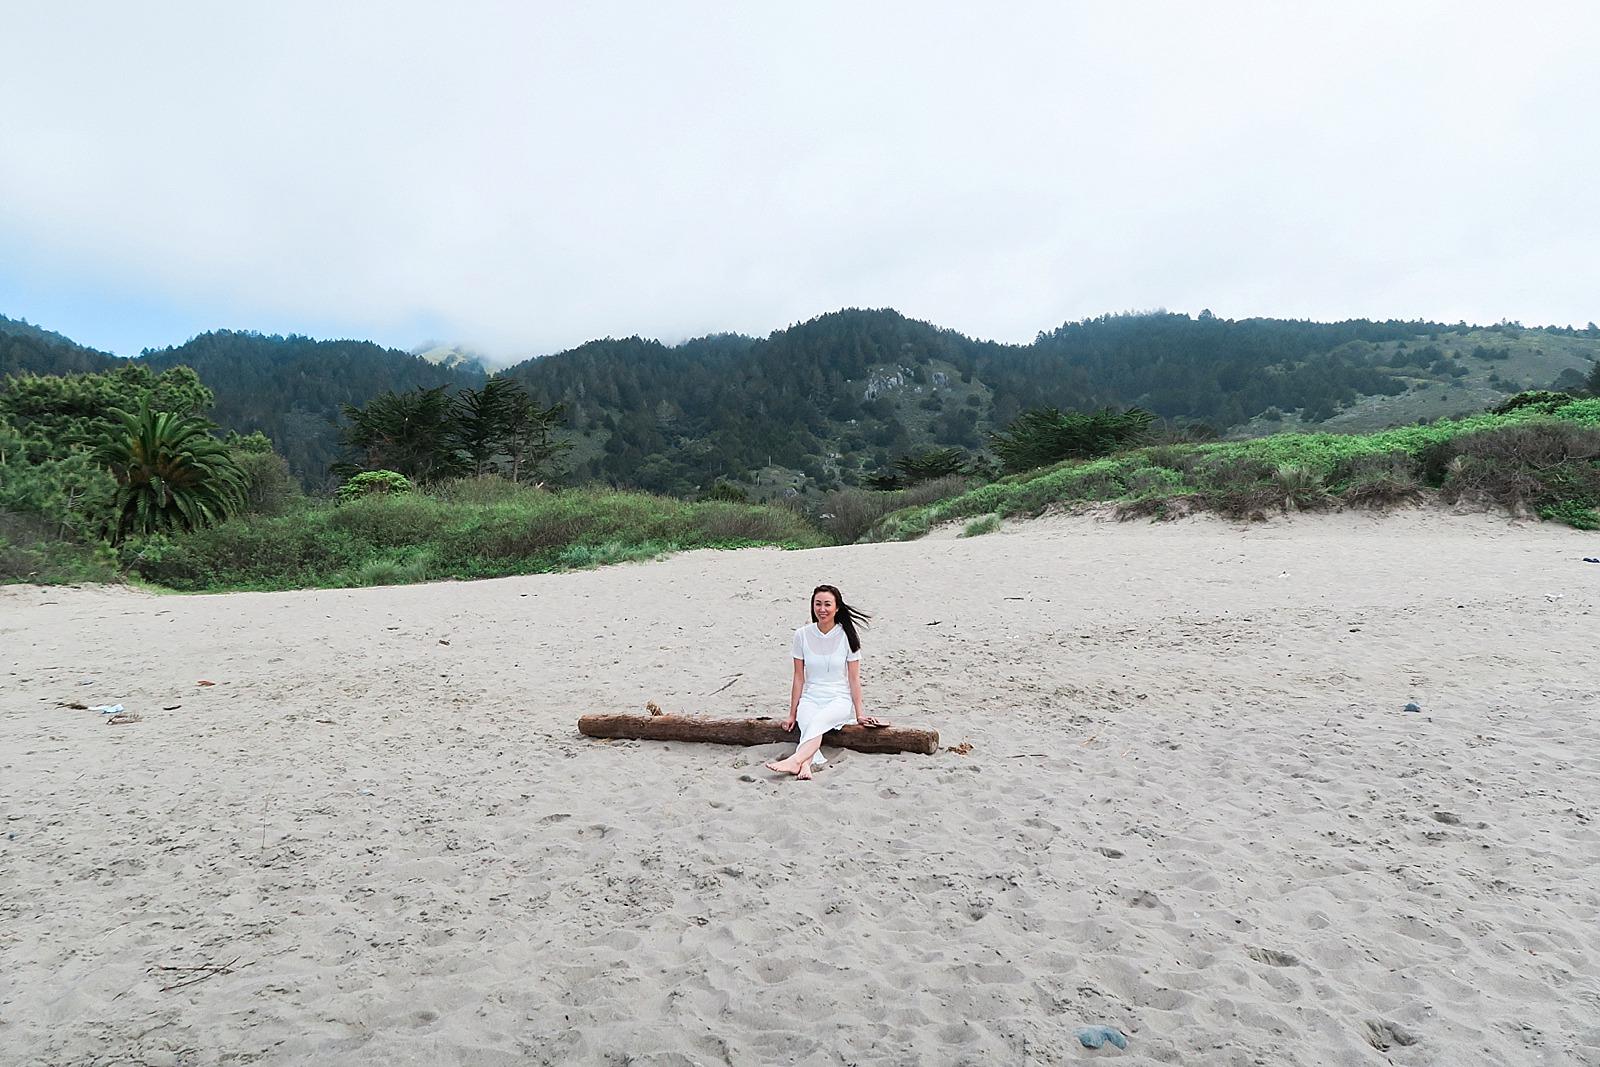 diana-elizabeth-blog-lifestyle-scotts-seed-sun-shade-lawn-games-setup-tutorial-0180